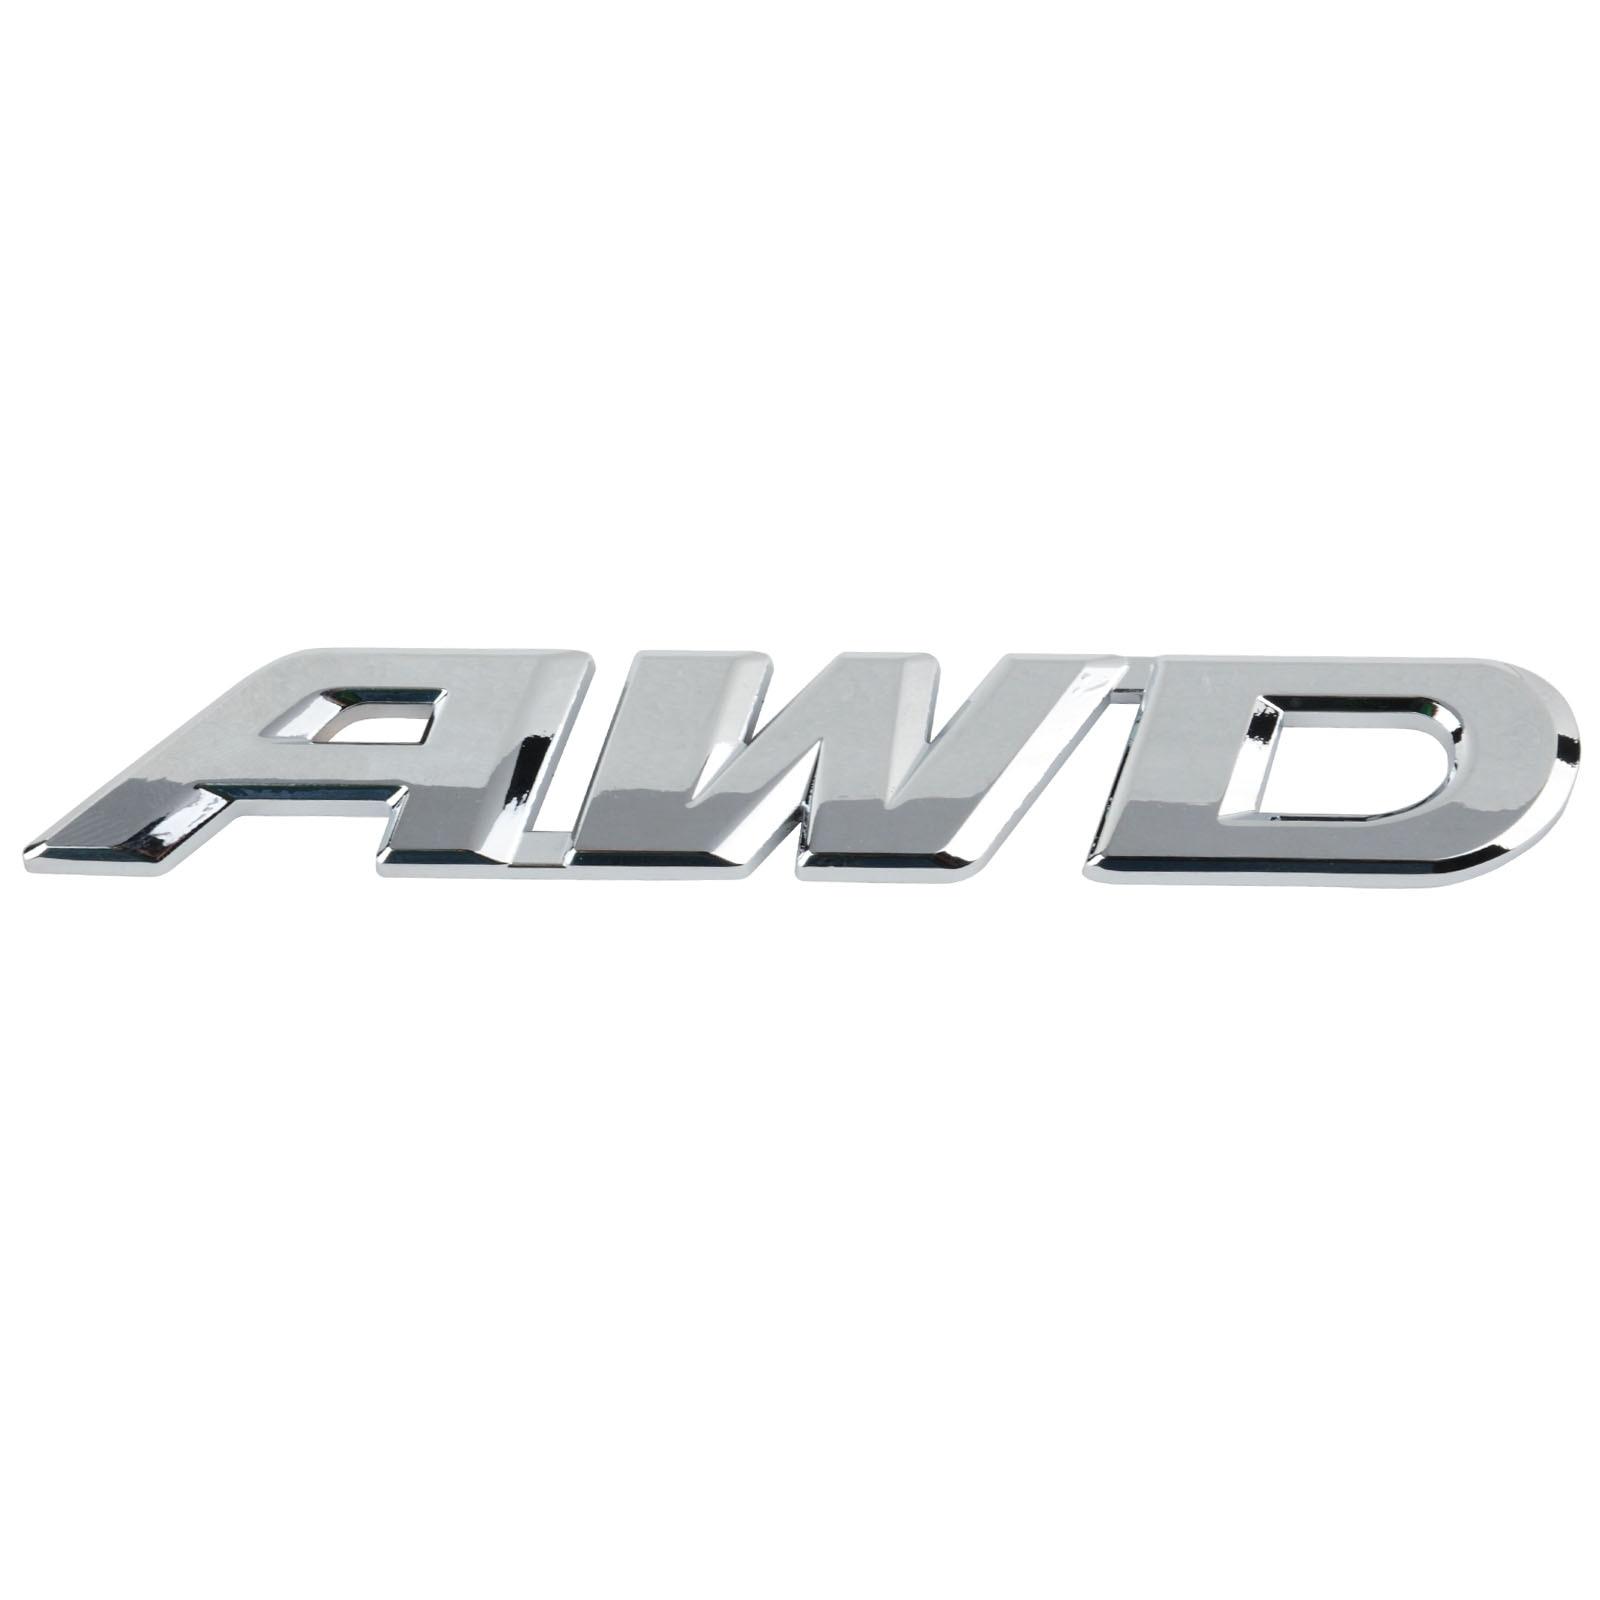 2018 V6+V8+4WD Car Chrome Plated ABS Silver 3D Decal Badge Emblem Sticker Auto